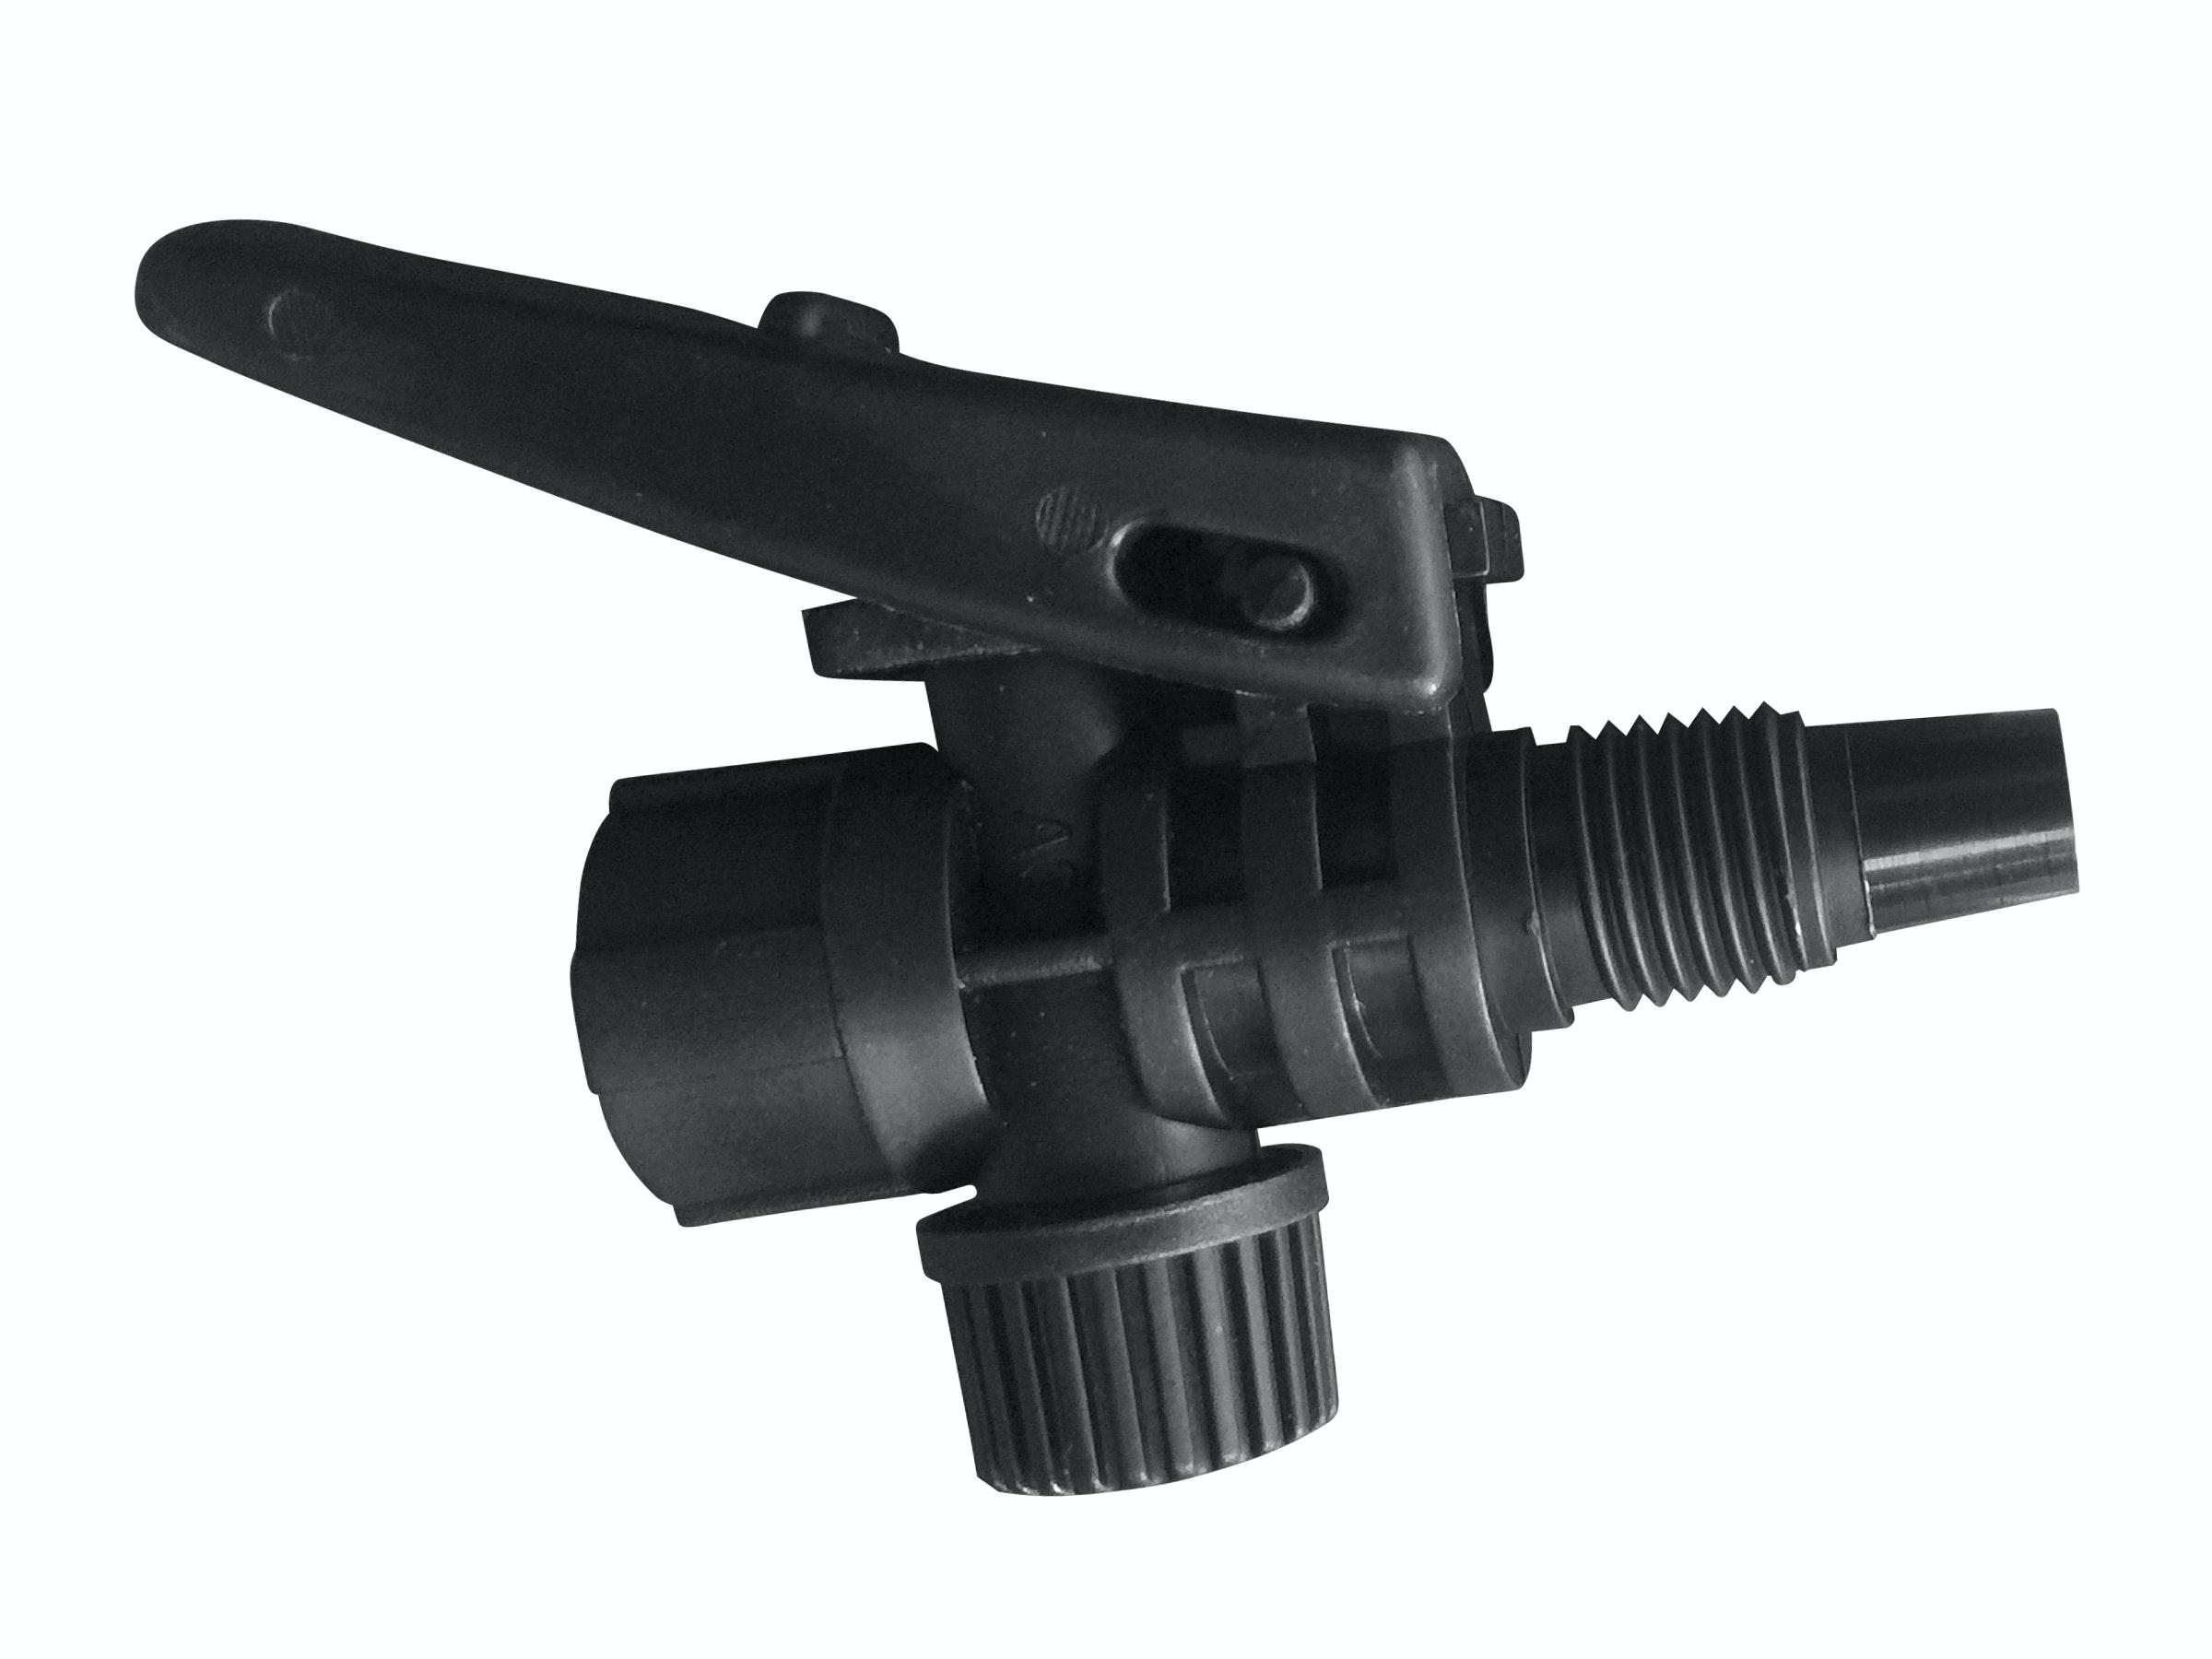 Sprayer Replacement Trigger